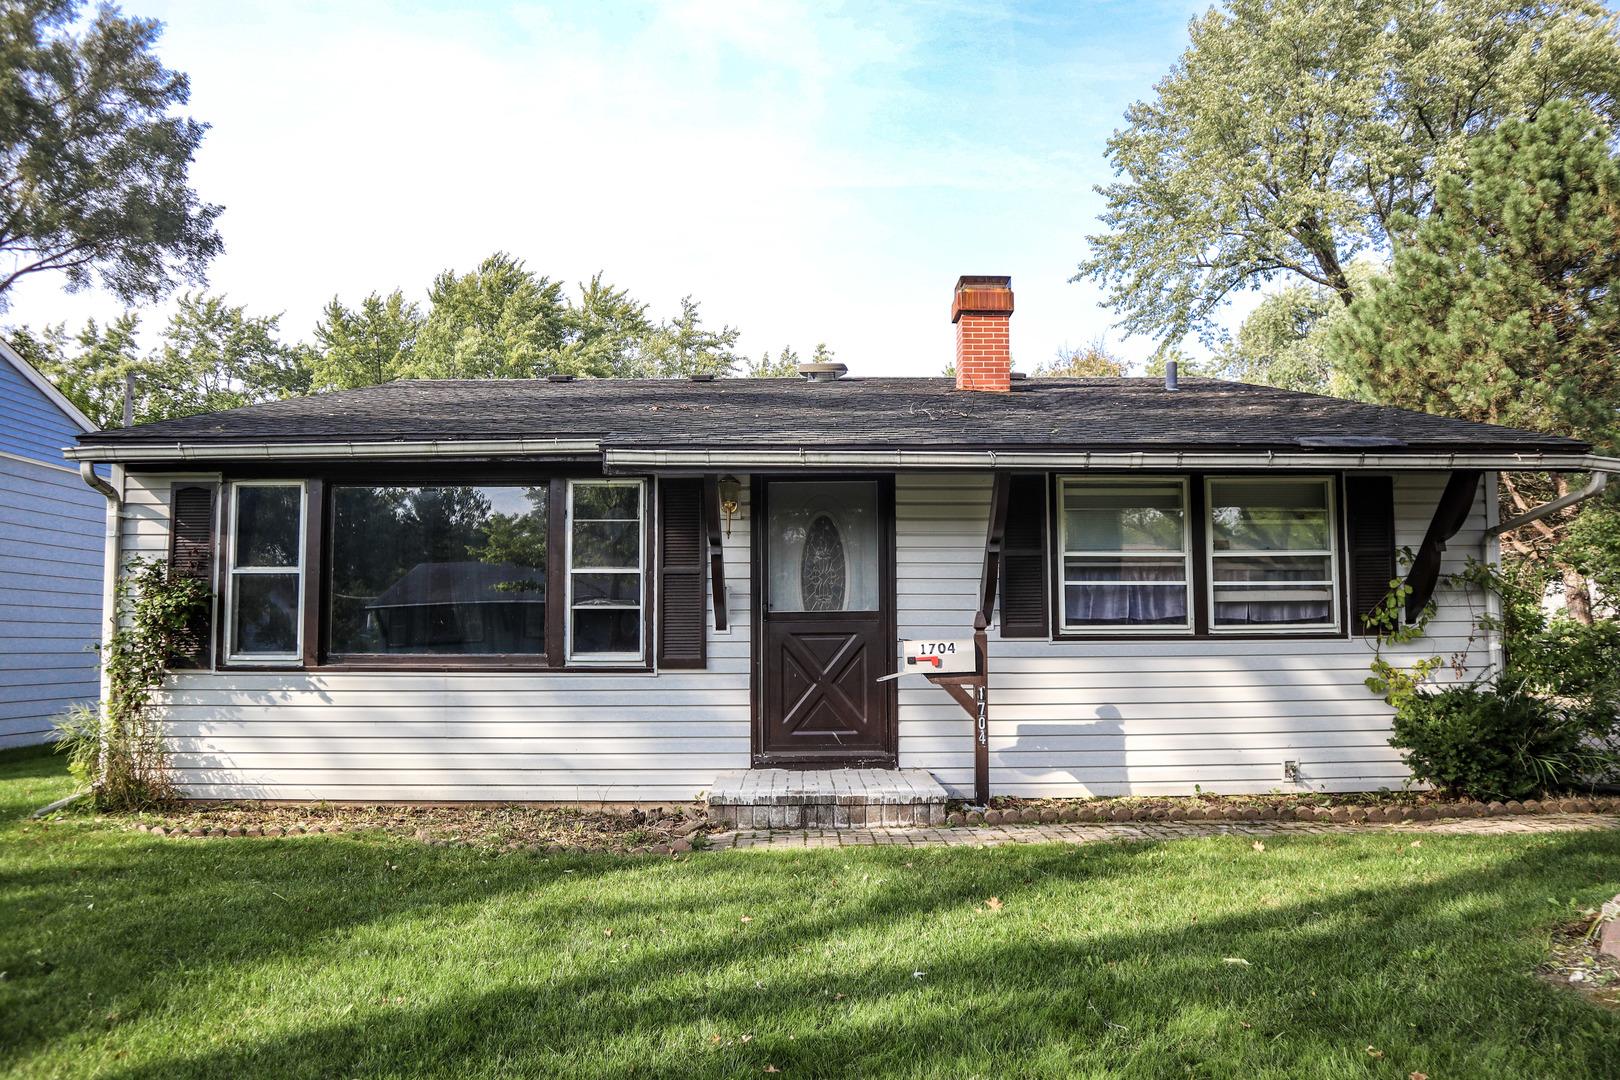 1704 Kingston Circle, Carpentersville IL 60110